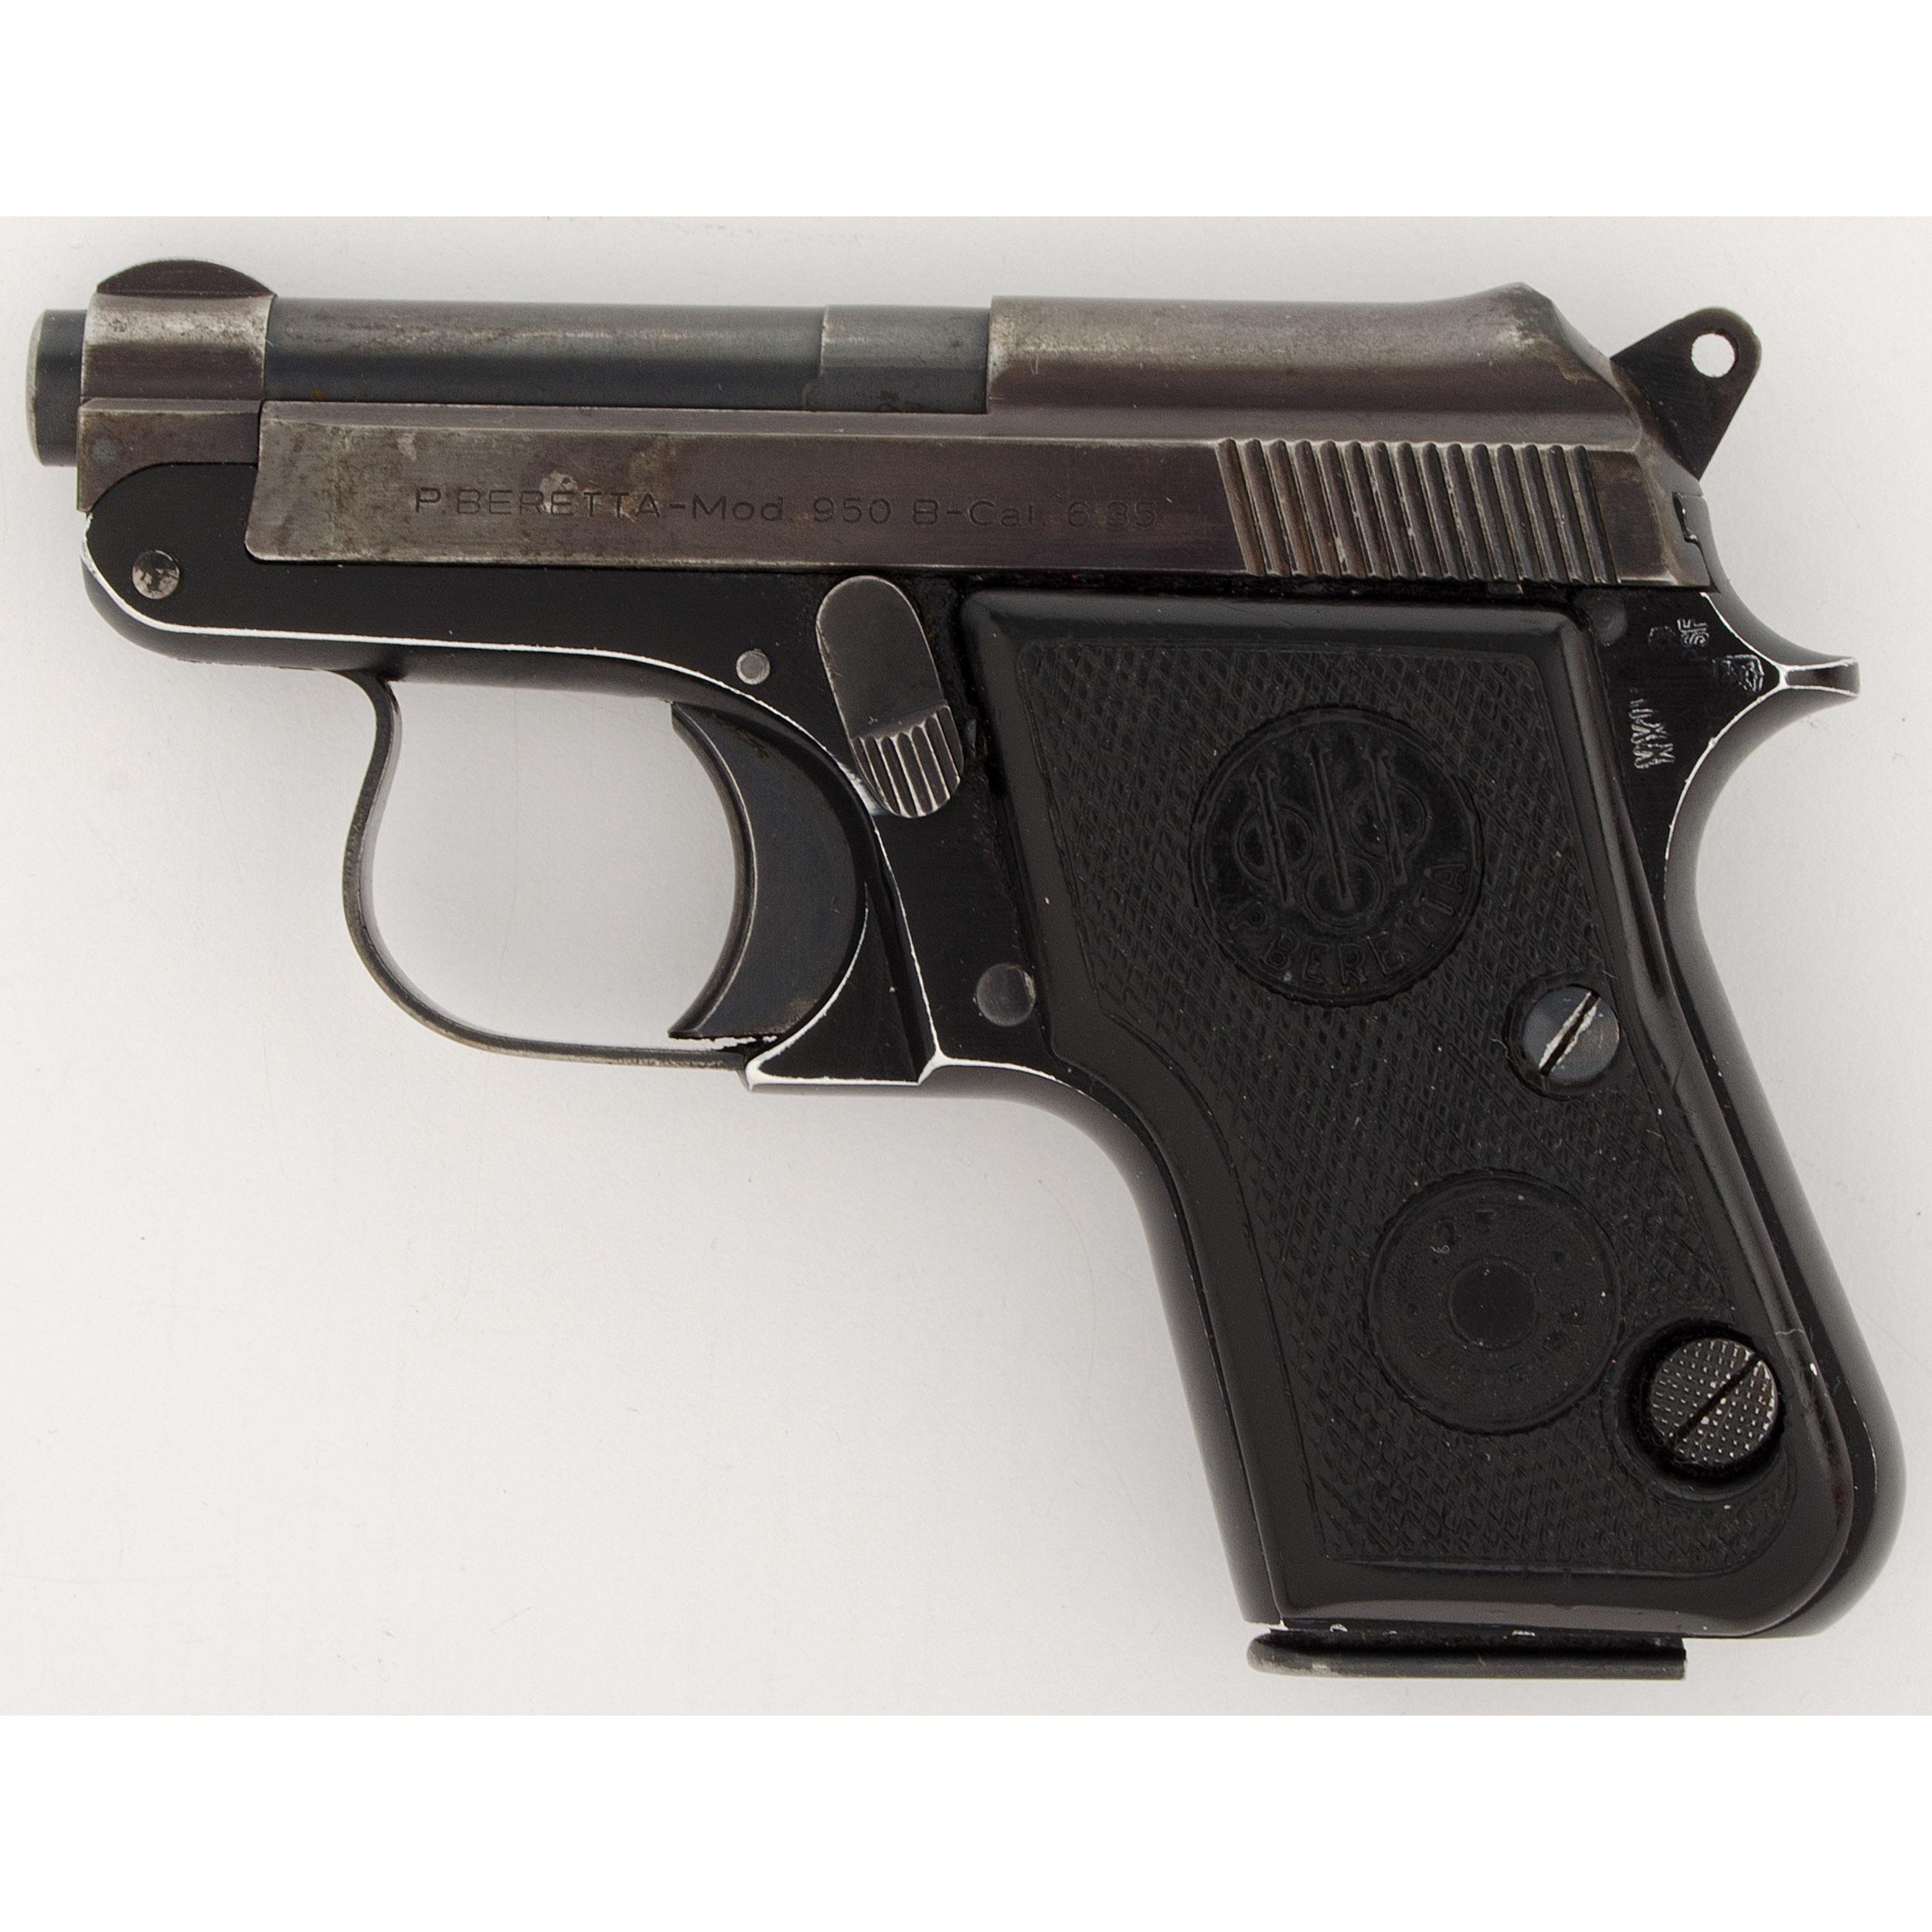 Beretta Model 950-B Pistol   Cowan's Auction House: The